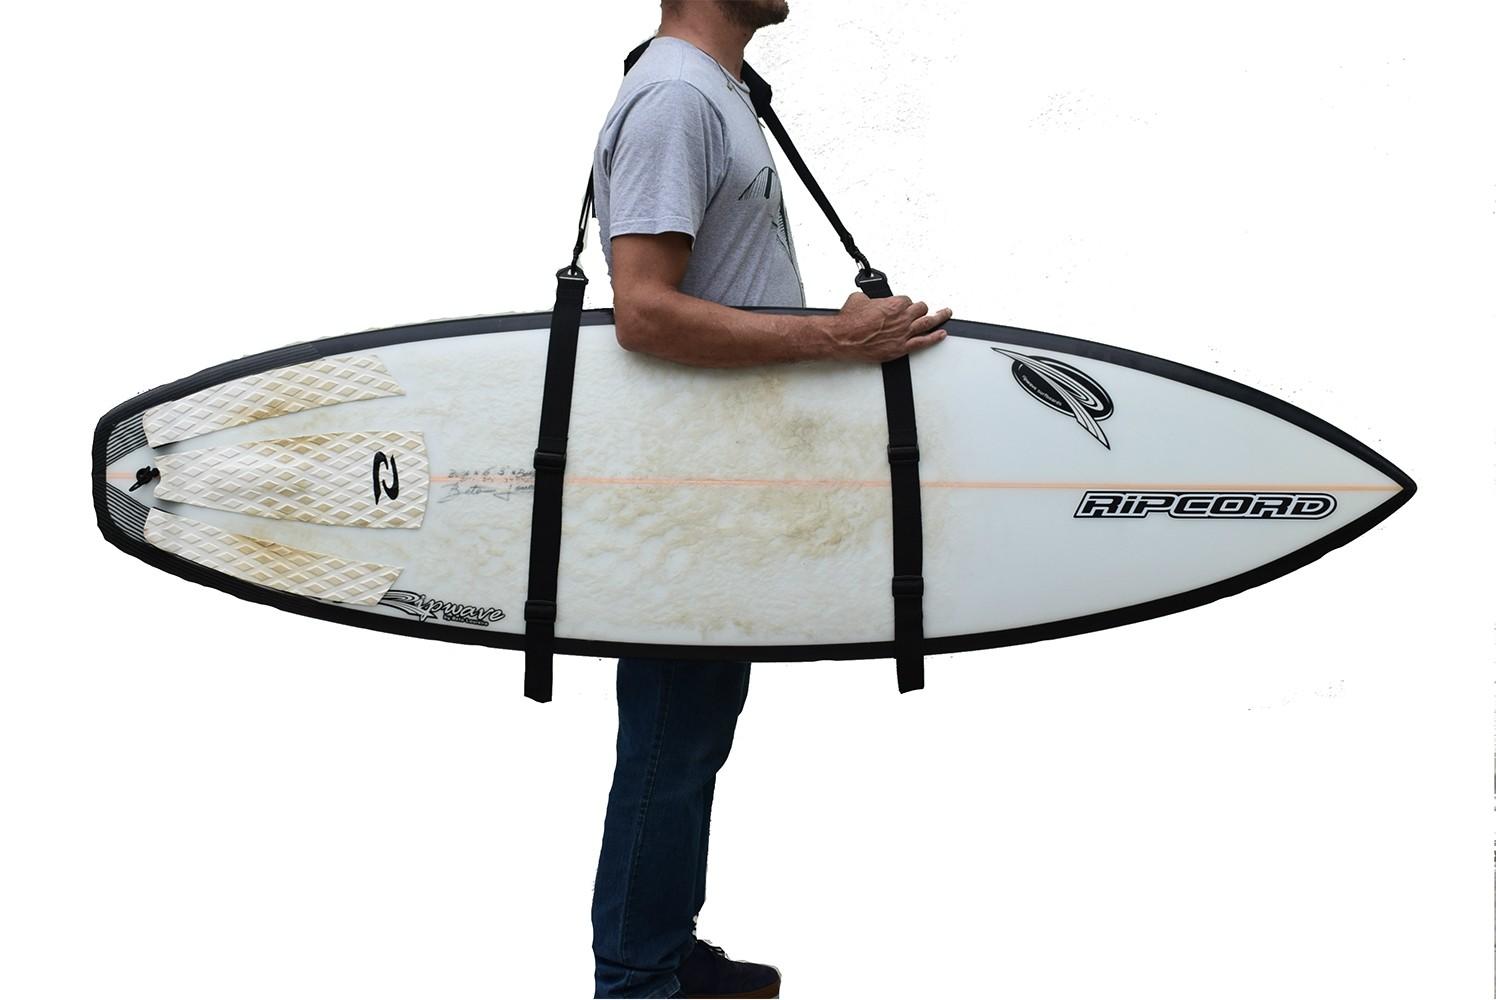 Alça de ombro para carregar Prancha de Surf até 9'6'' | Prancharia